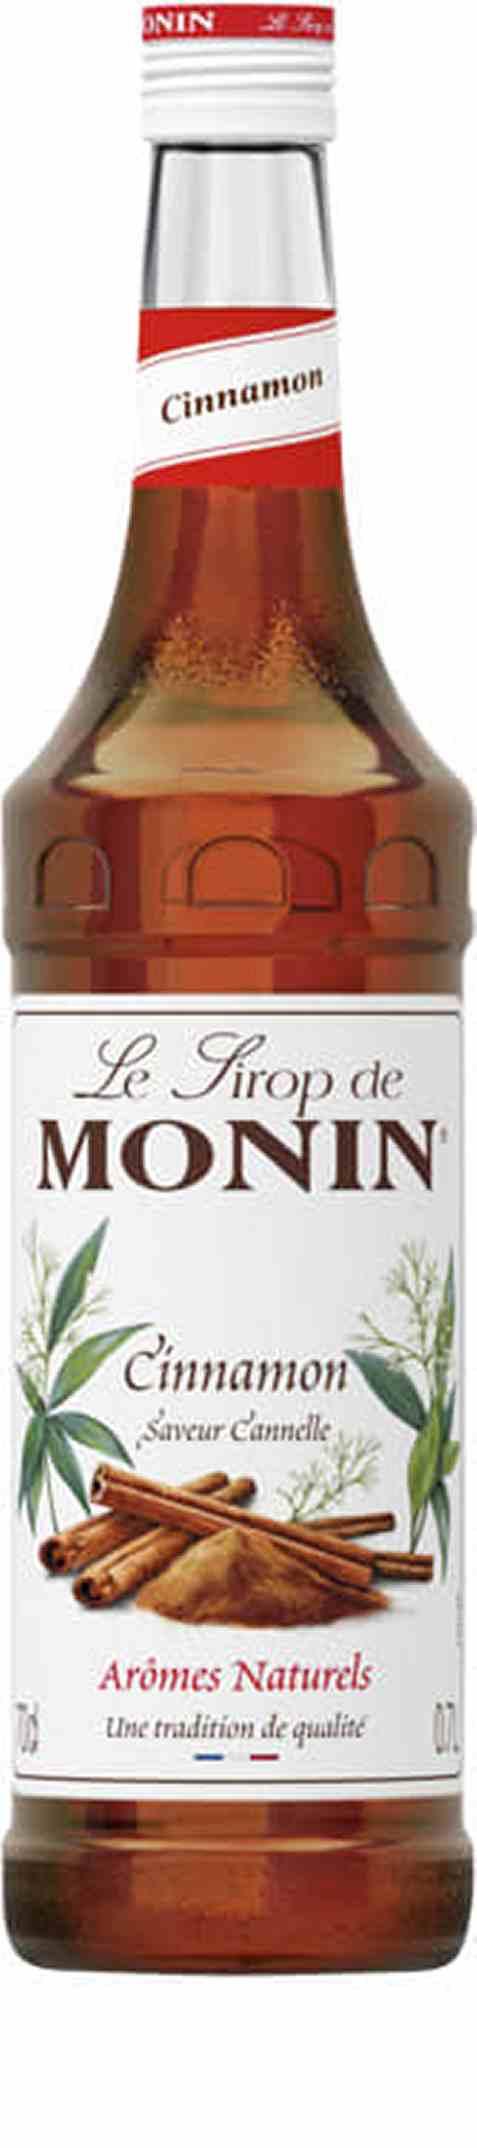 Bilde av Monin Kaffe sirup kanel.